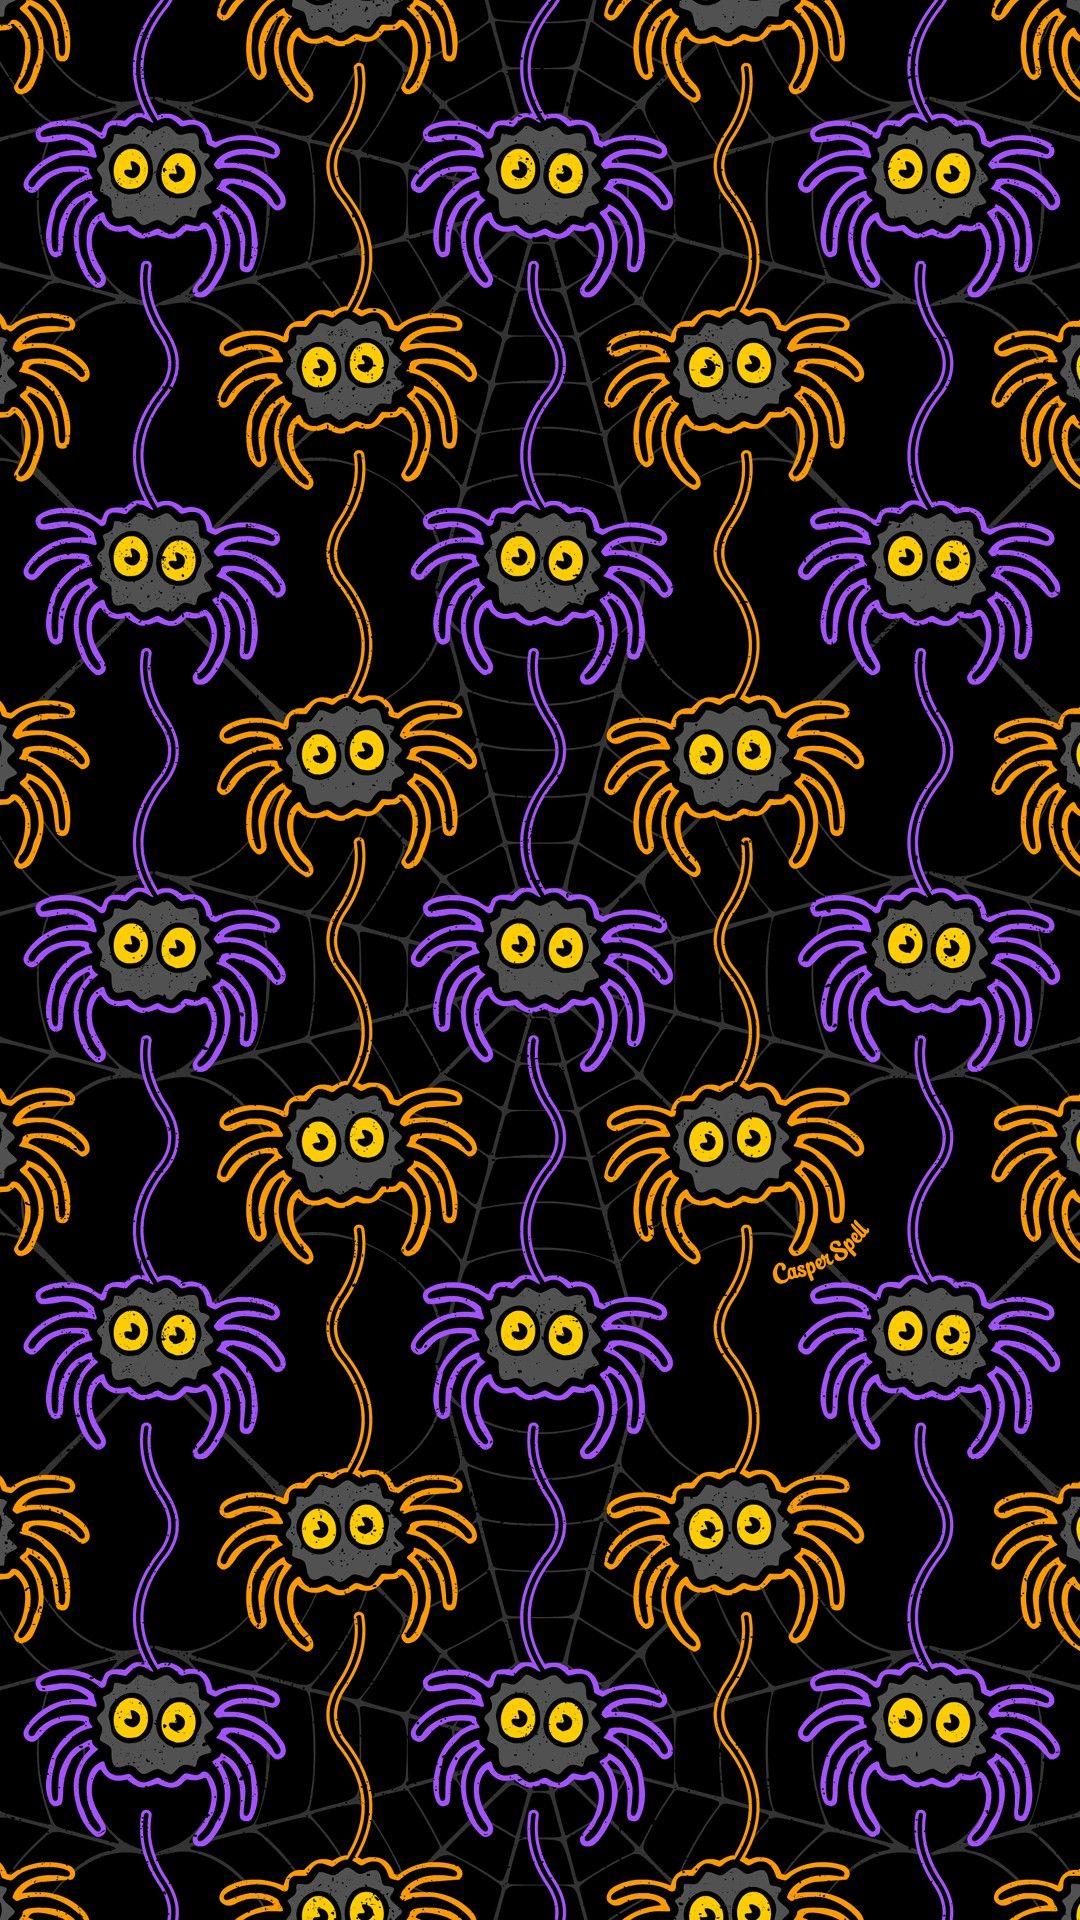 Spider Pattern By Casper Spell Halloween Wallpaper Halloween Wallpaper Iphone Spooky Background